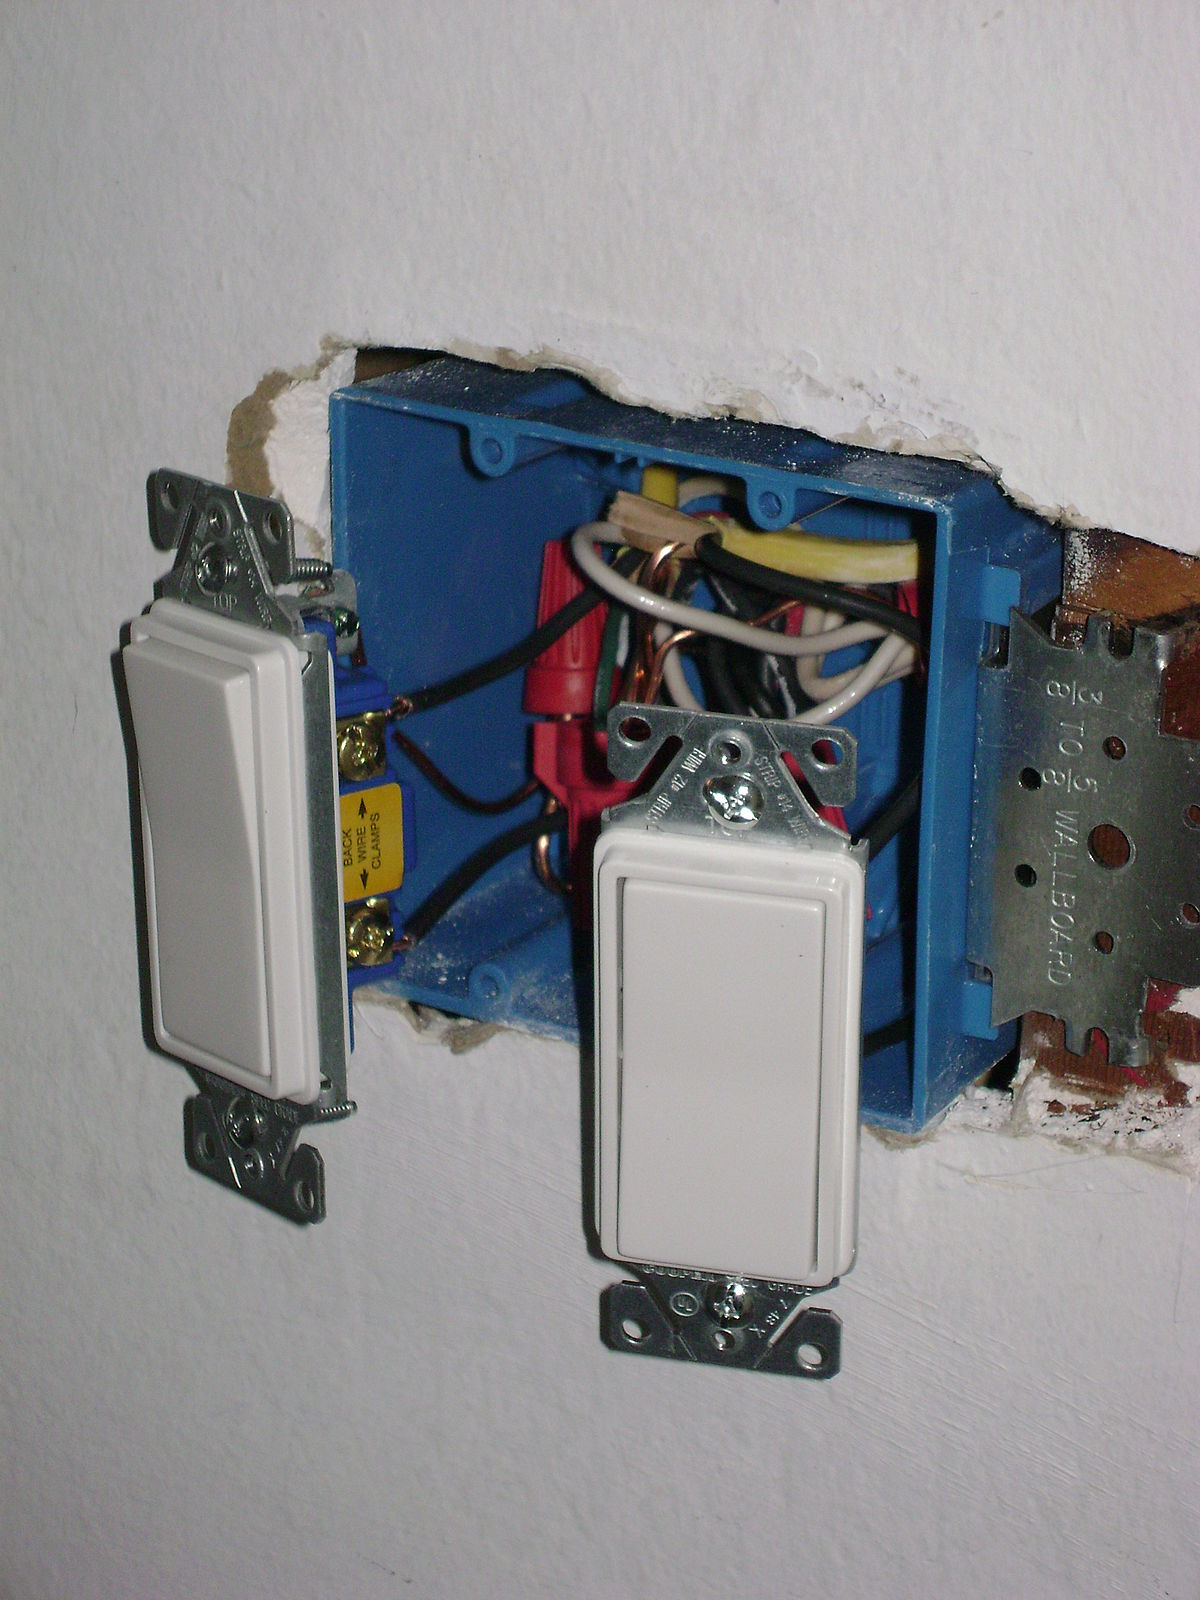 Homemade Fuse Box Wiring Diagram Bots Home Circuit Breaker Box Home Made  Fuse Box Holder